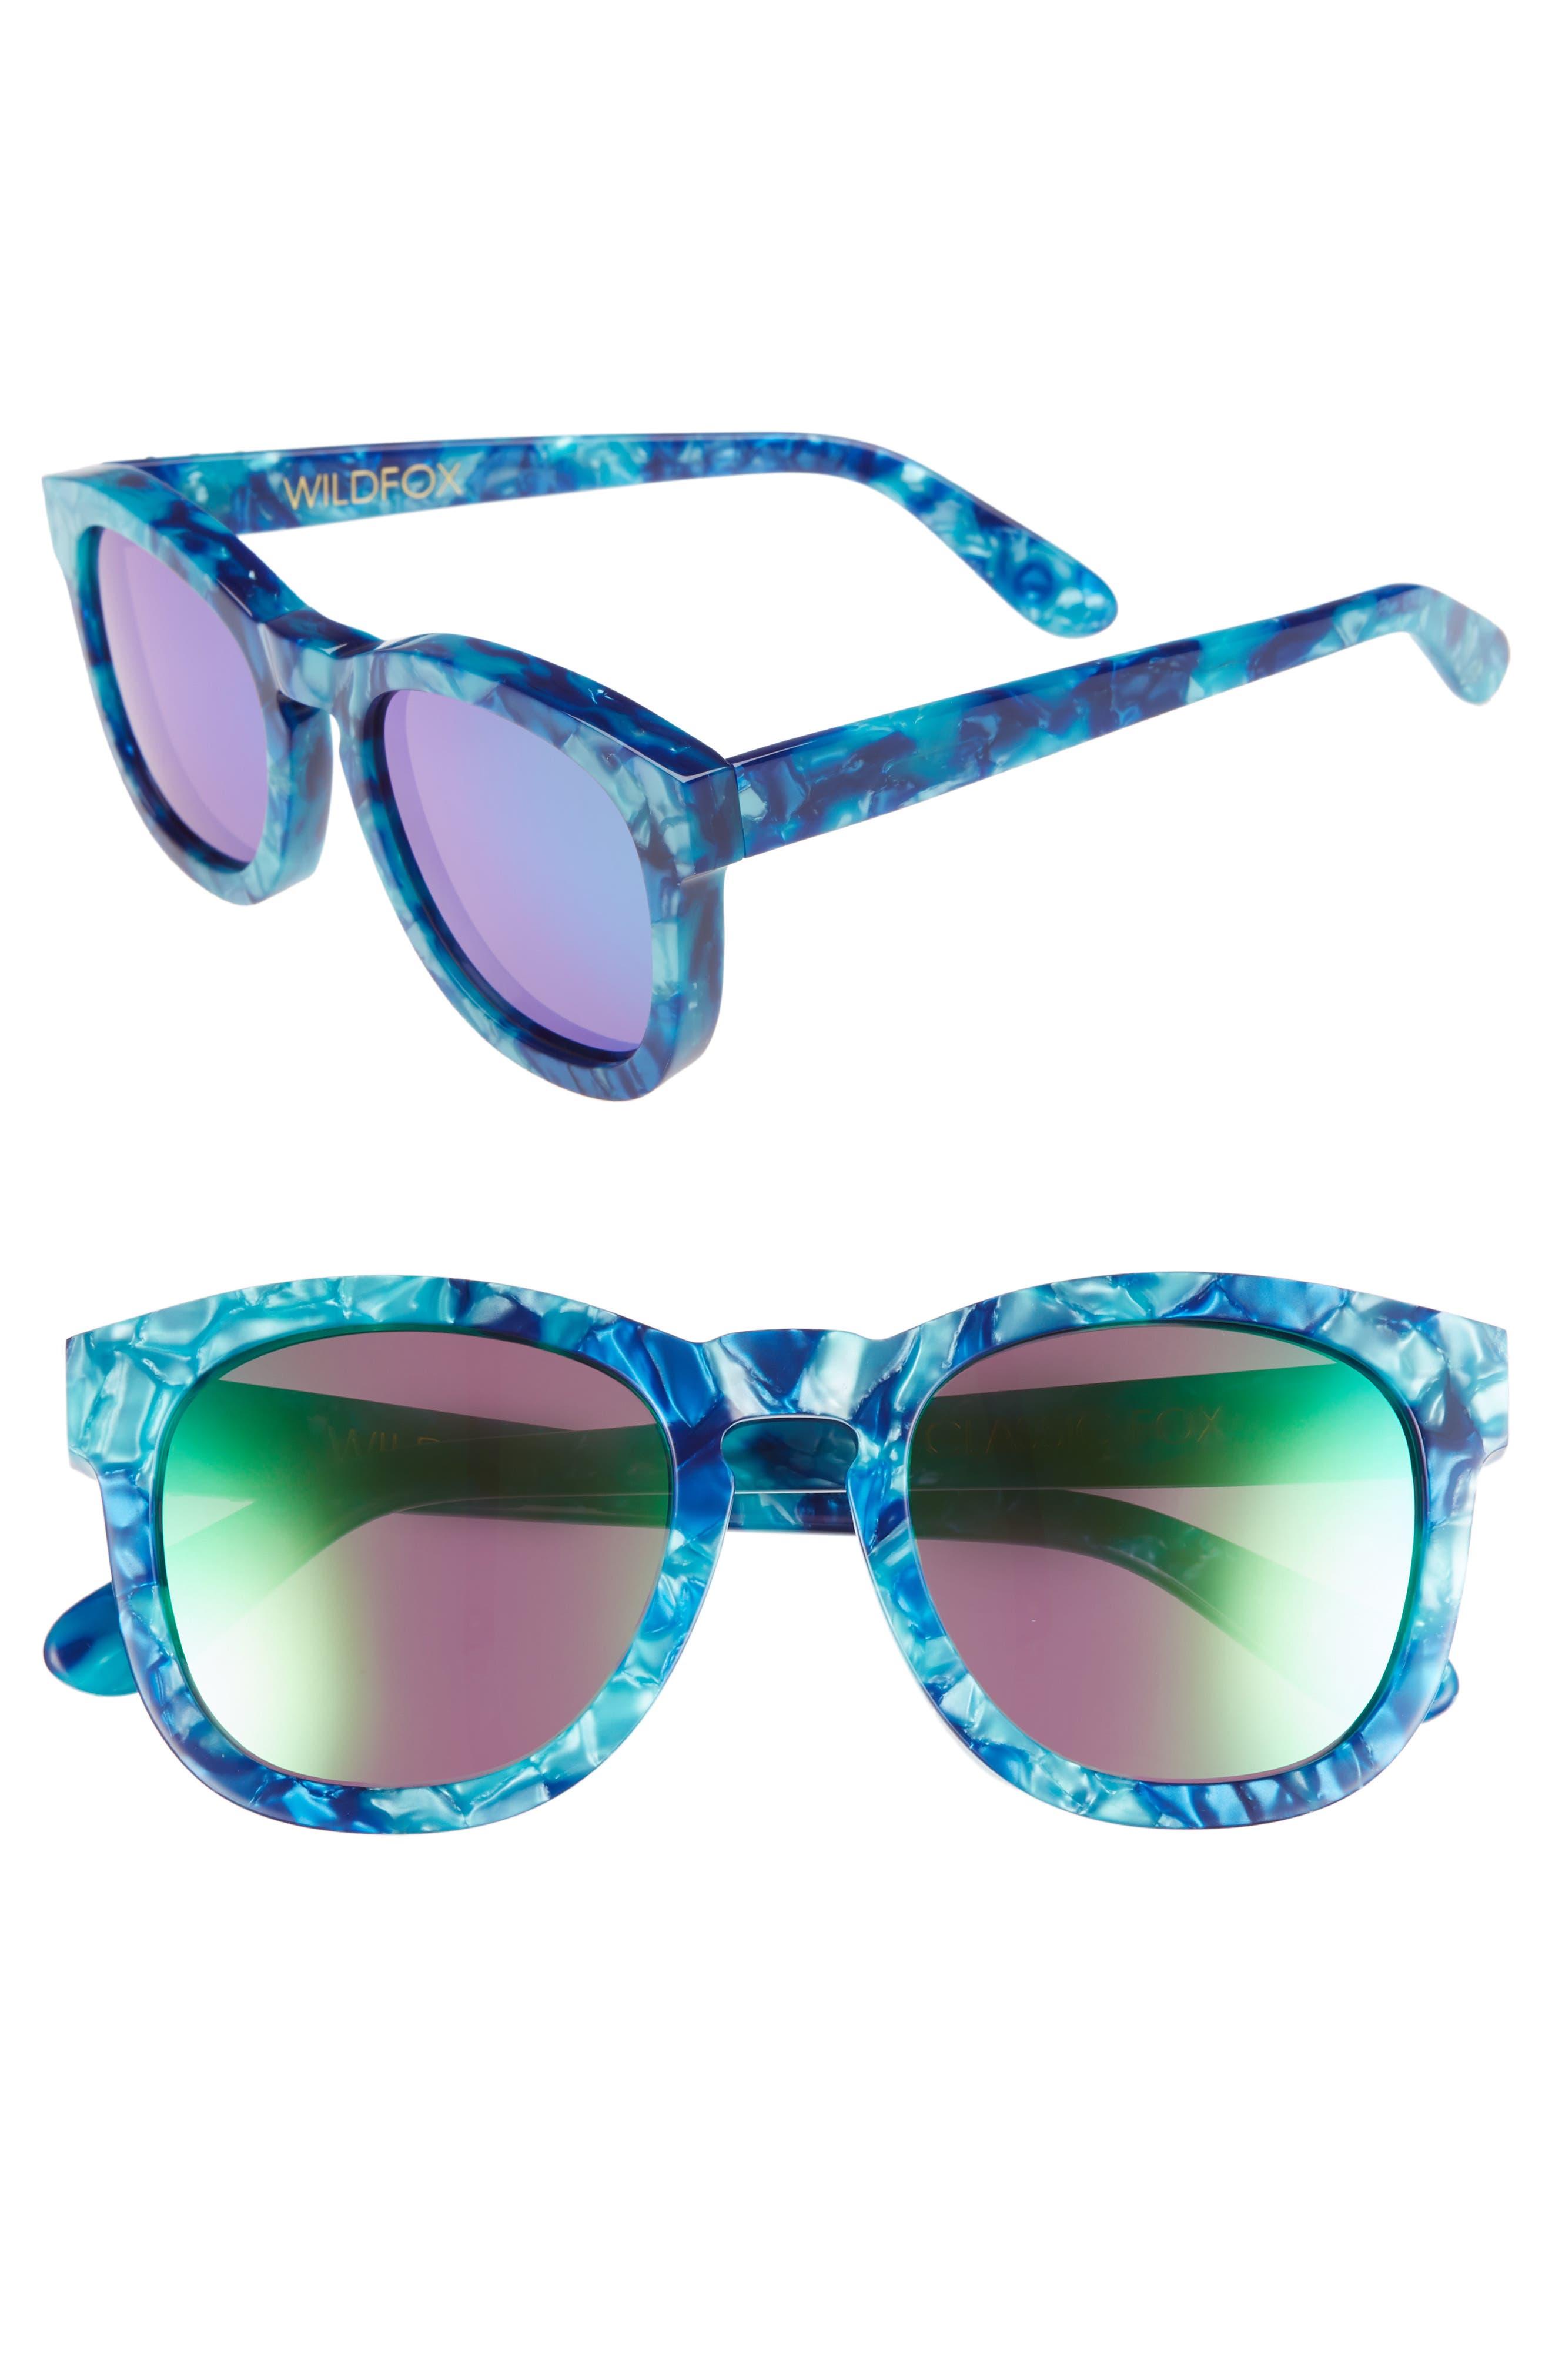 WILDFOX, Classic Fox - Deluxe 59mm Sunglasses, Main thumbnail 1, color, MONTEREY/ GREEN MIRROR